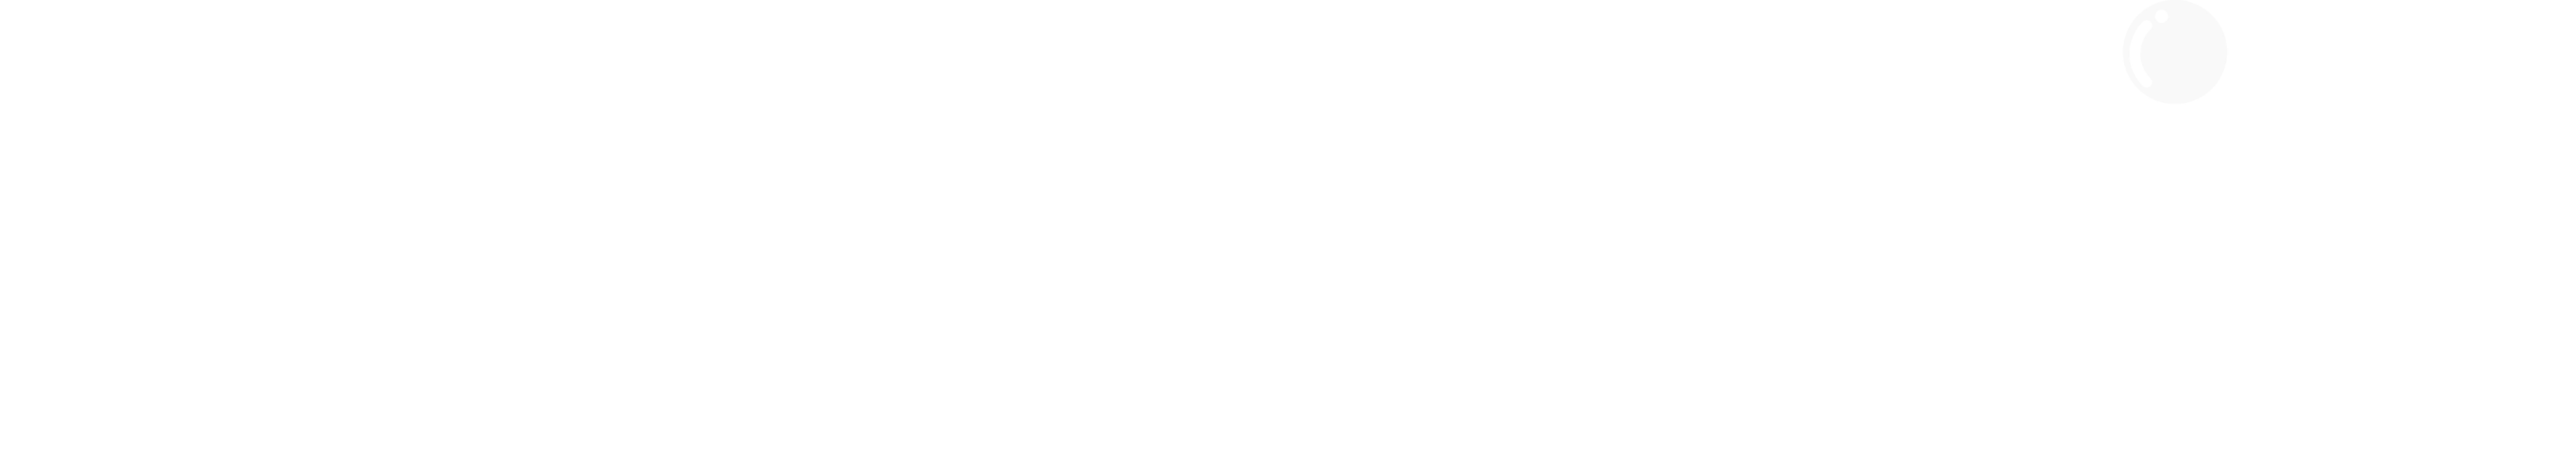 Washbear Studio Logo